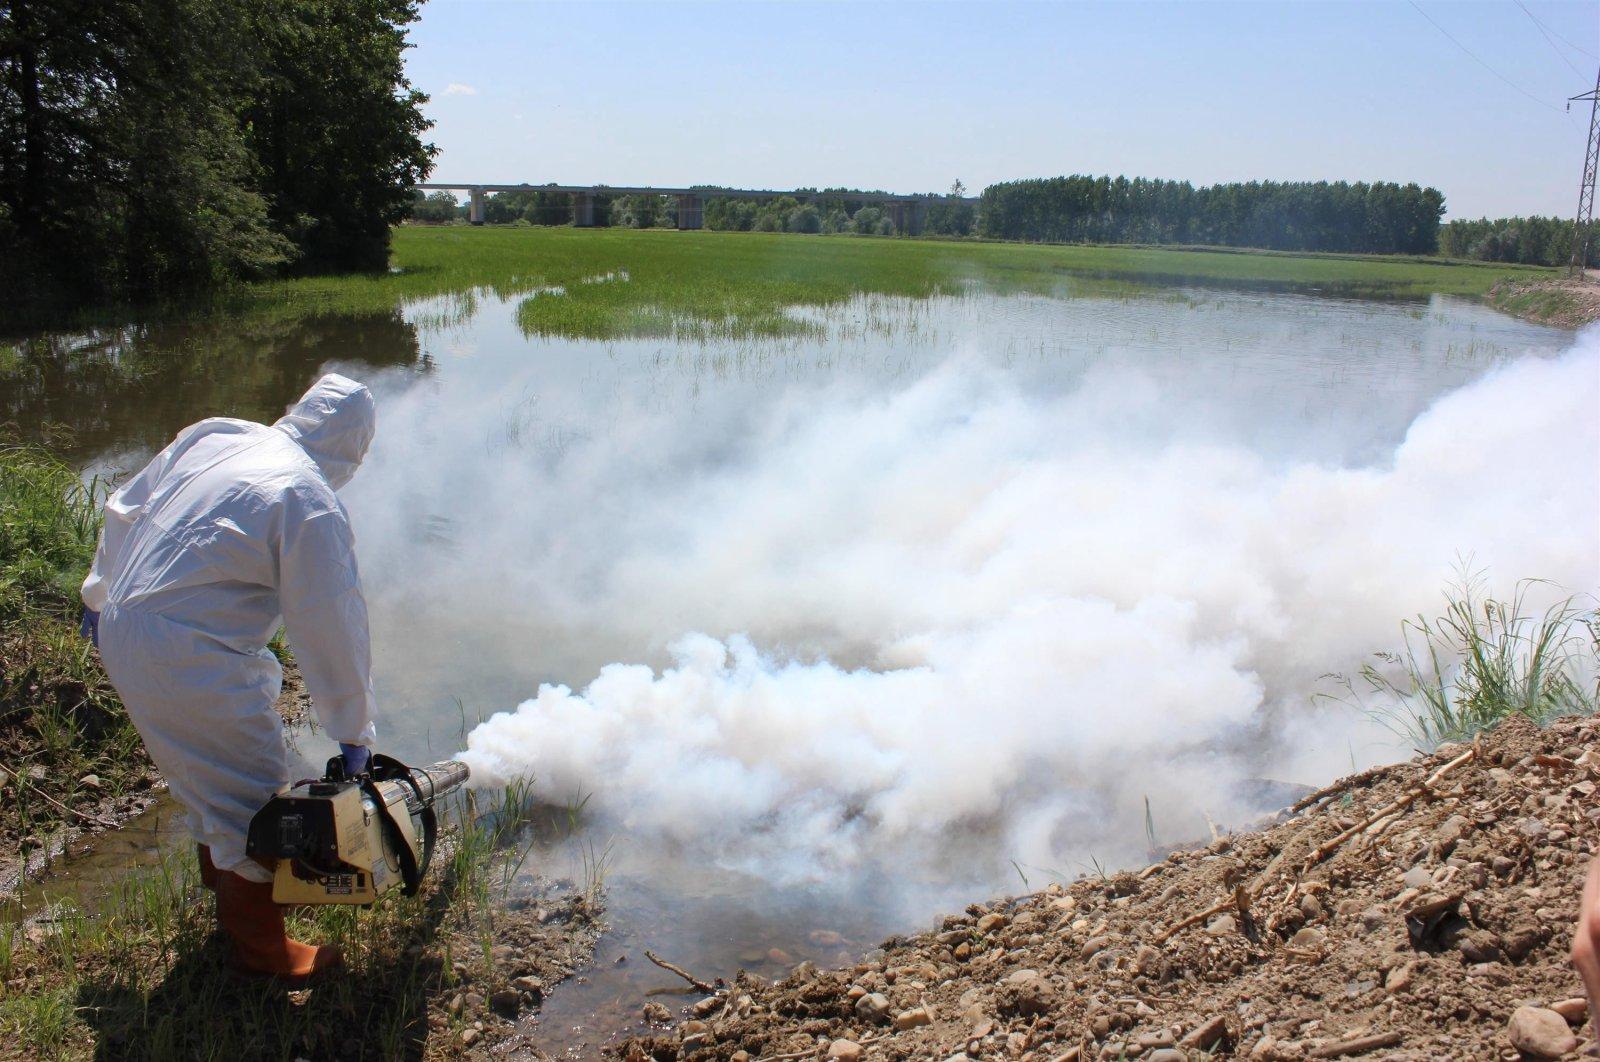 A municipality worker sprays pesticide to kill mosquitoes in Edirne, northwestern Turkey, July 16, 2015. (İHA PHOTO)